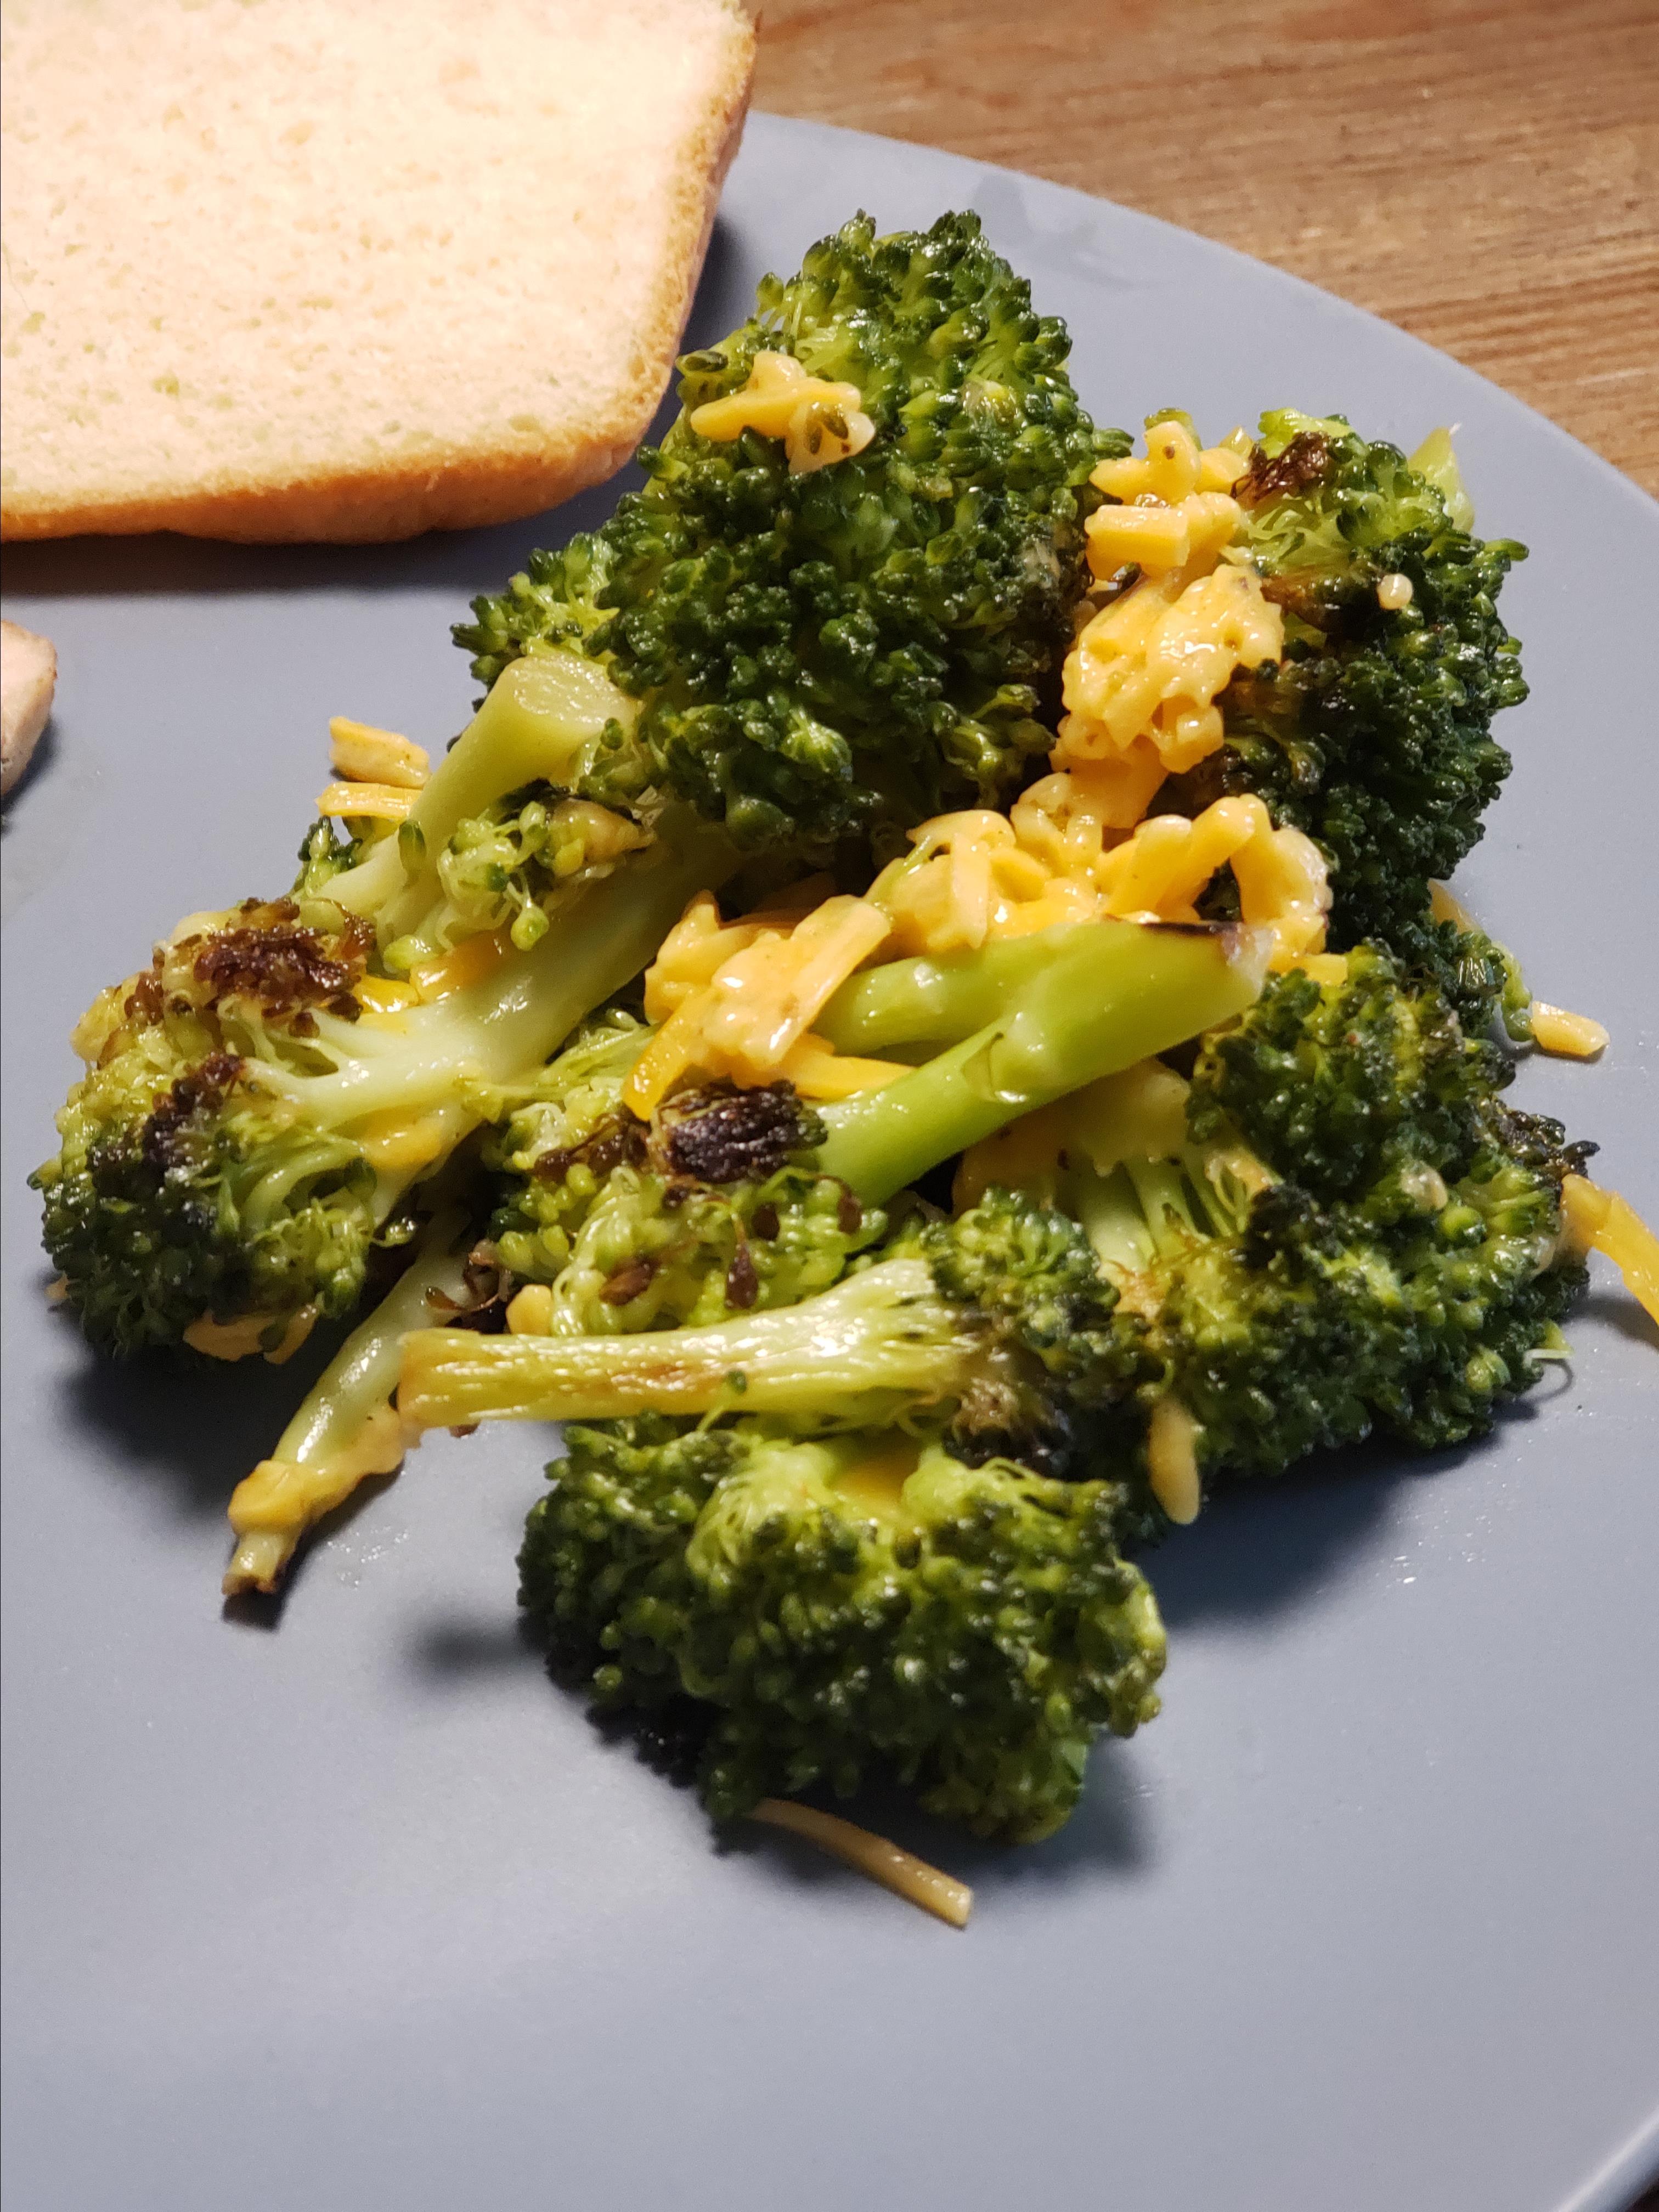 Cheesy Grilled Broccoli CLDaigle